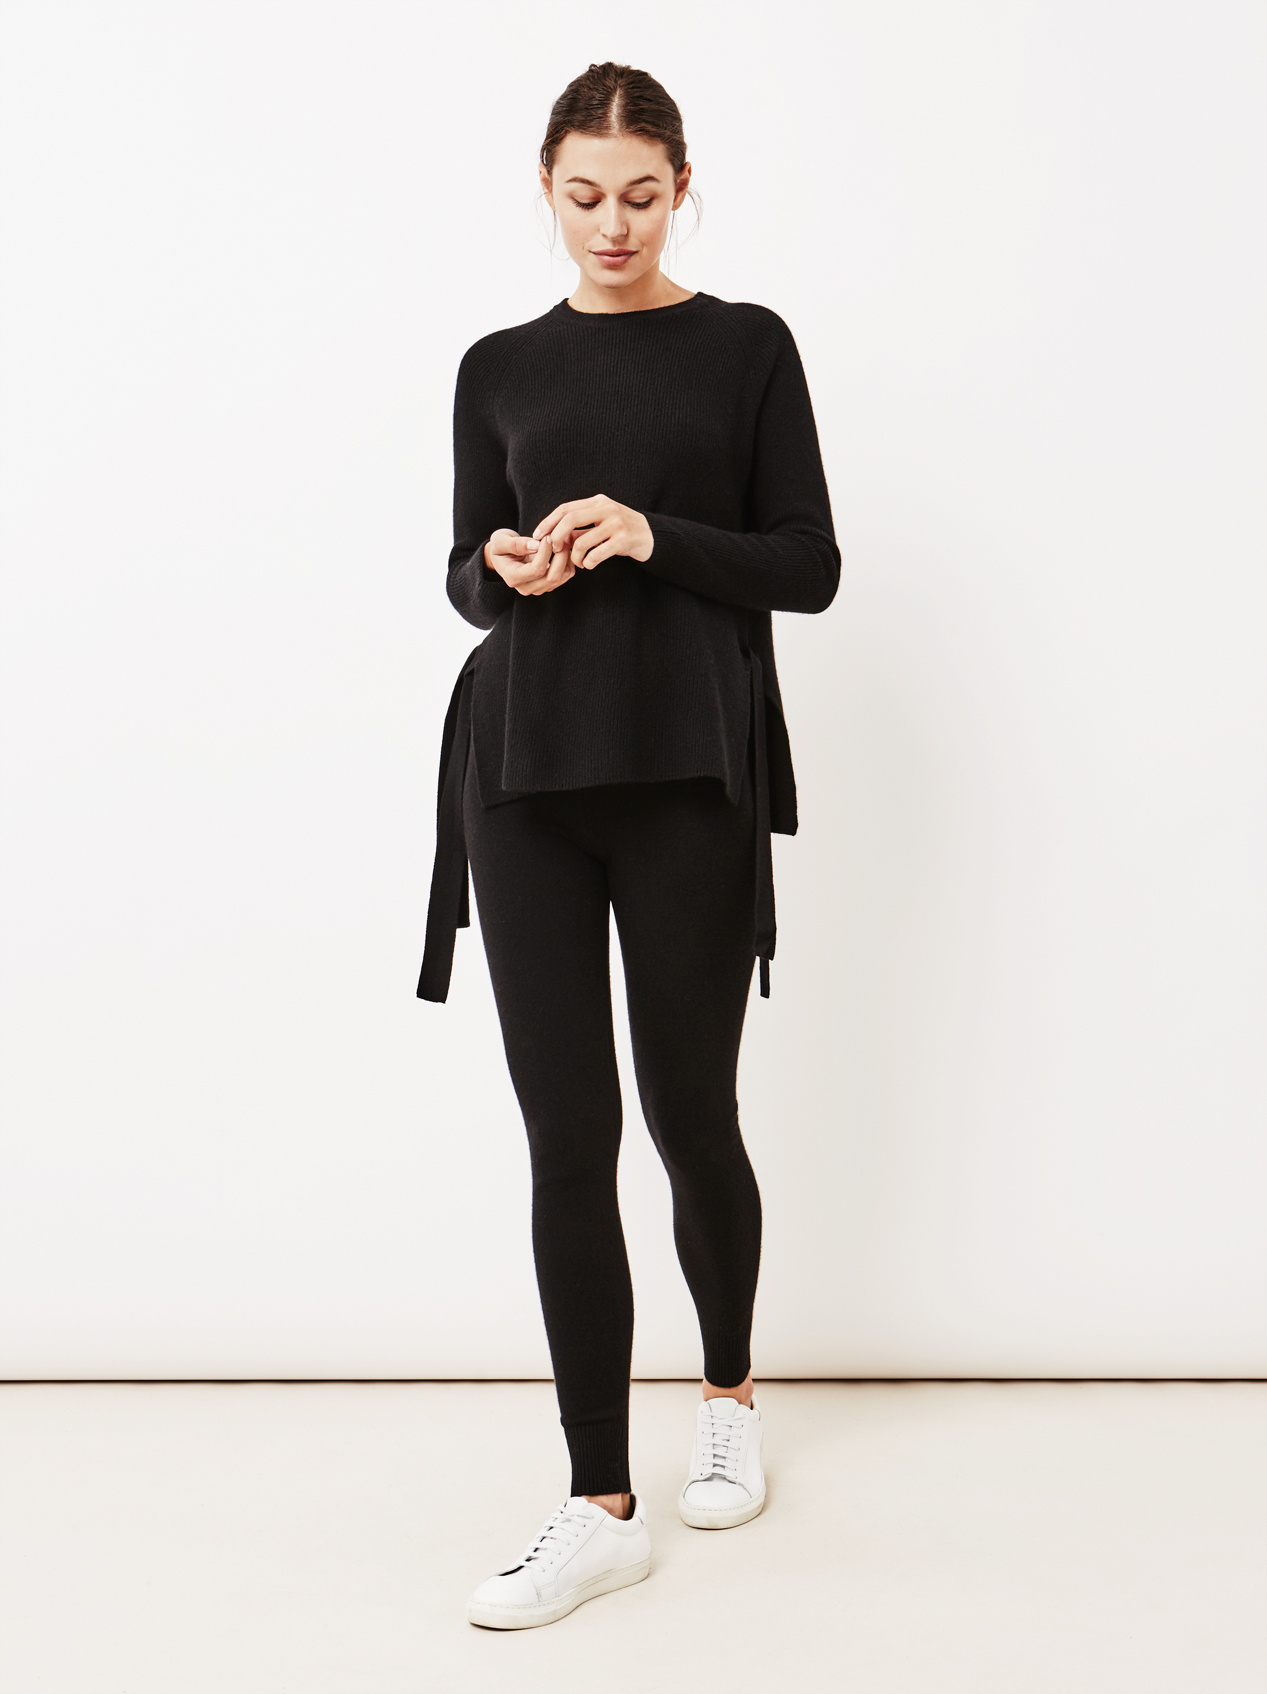 Soft Goat Women's Side Knot Sweater Black